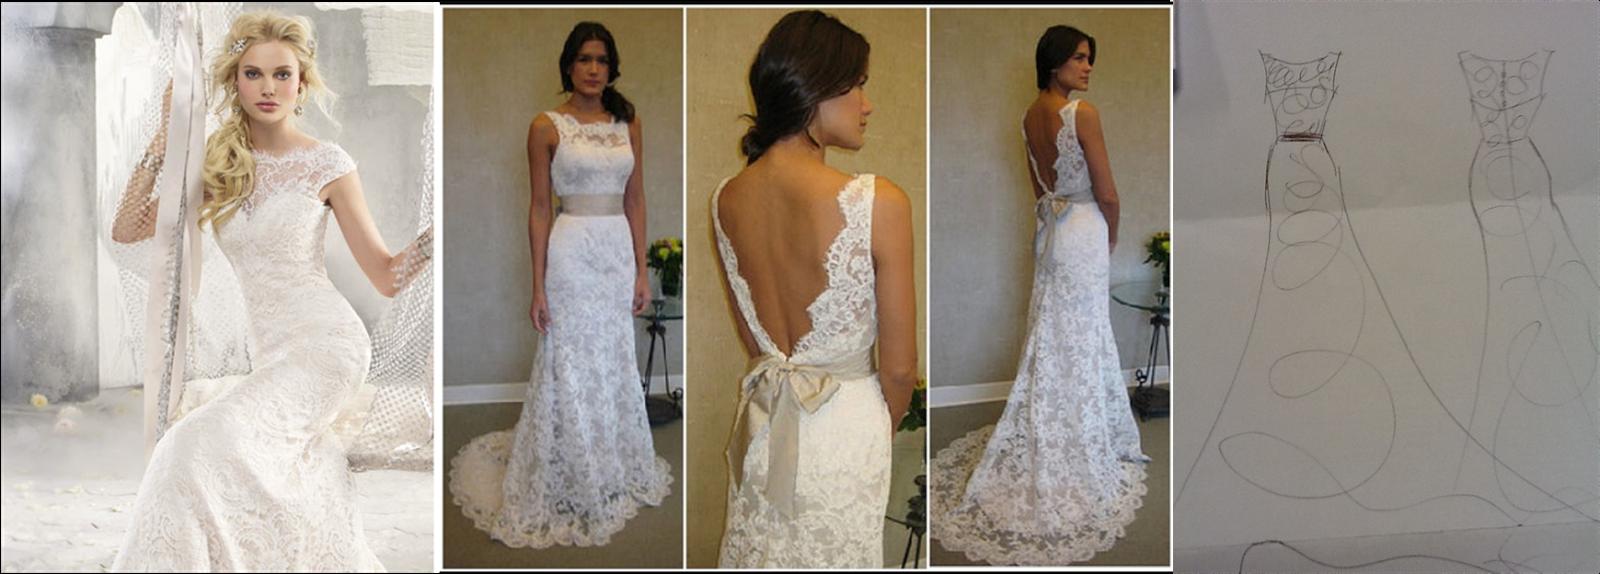 Close Shot Of The Dress